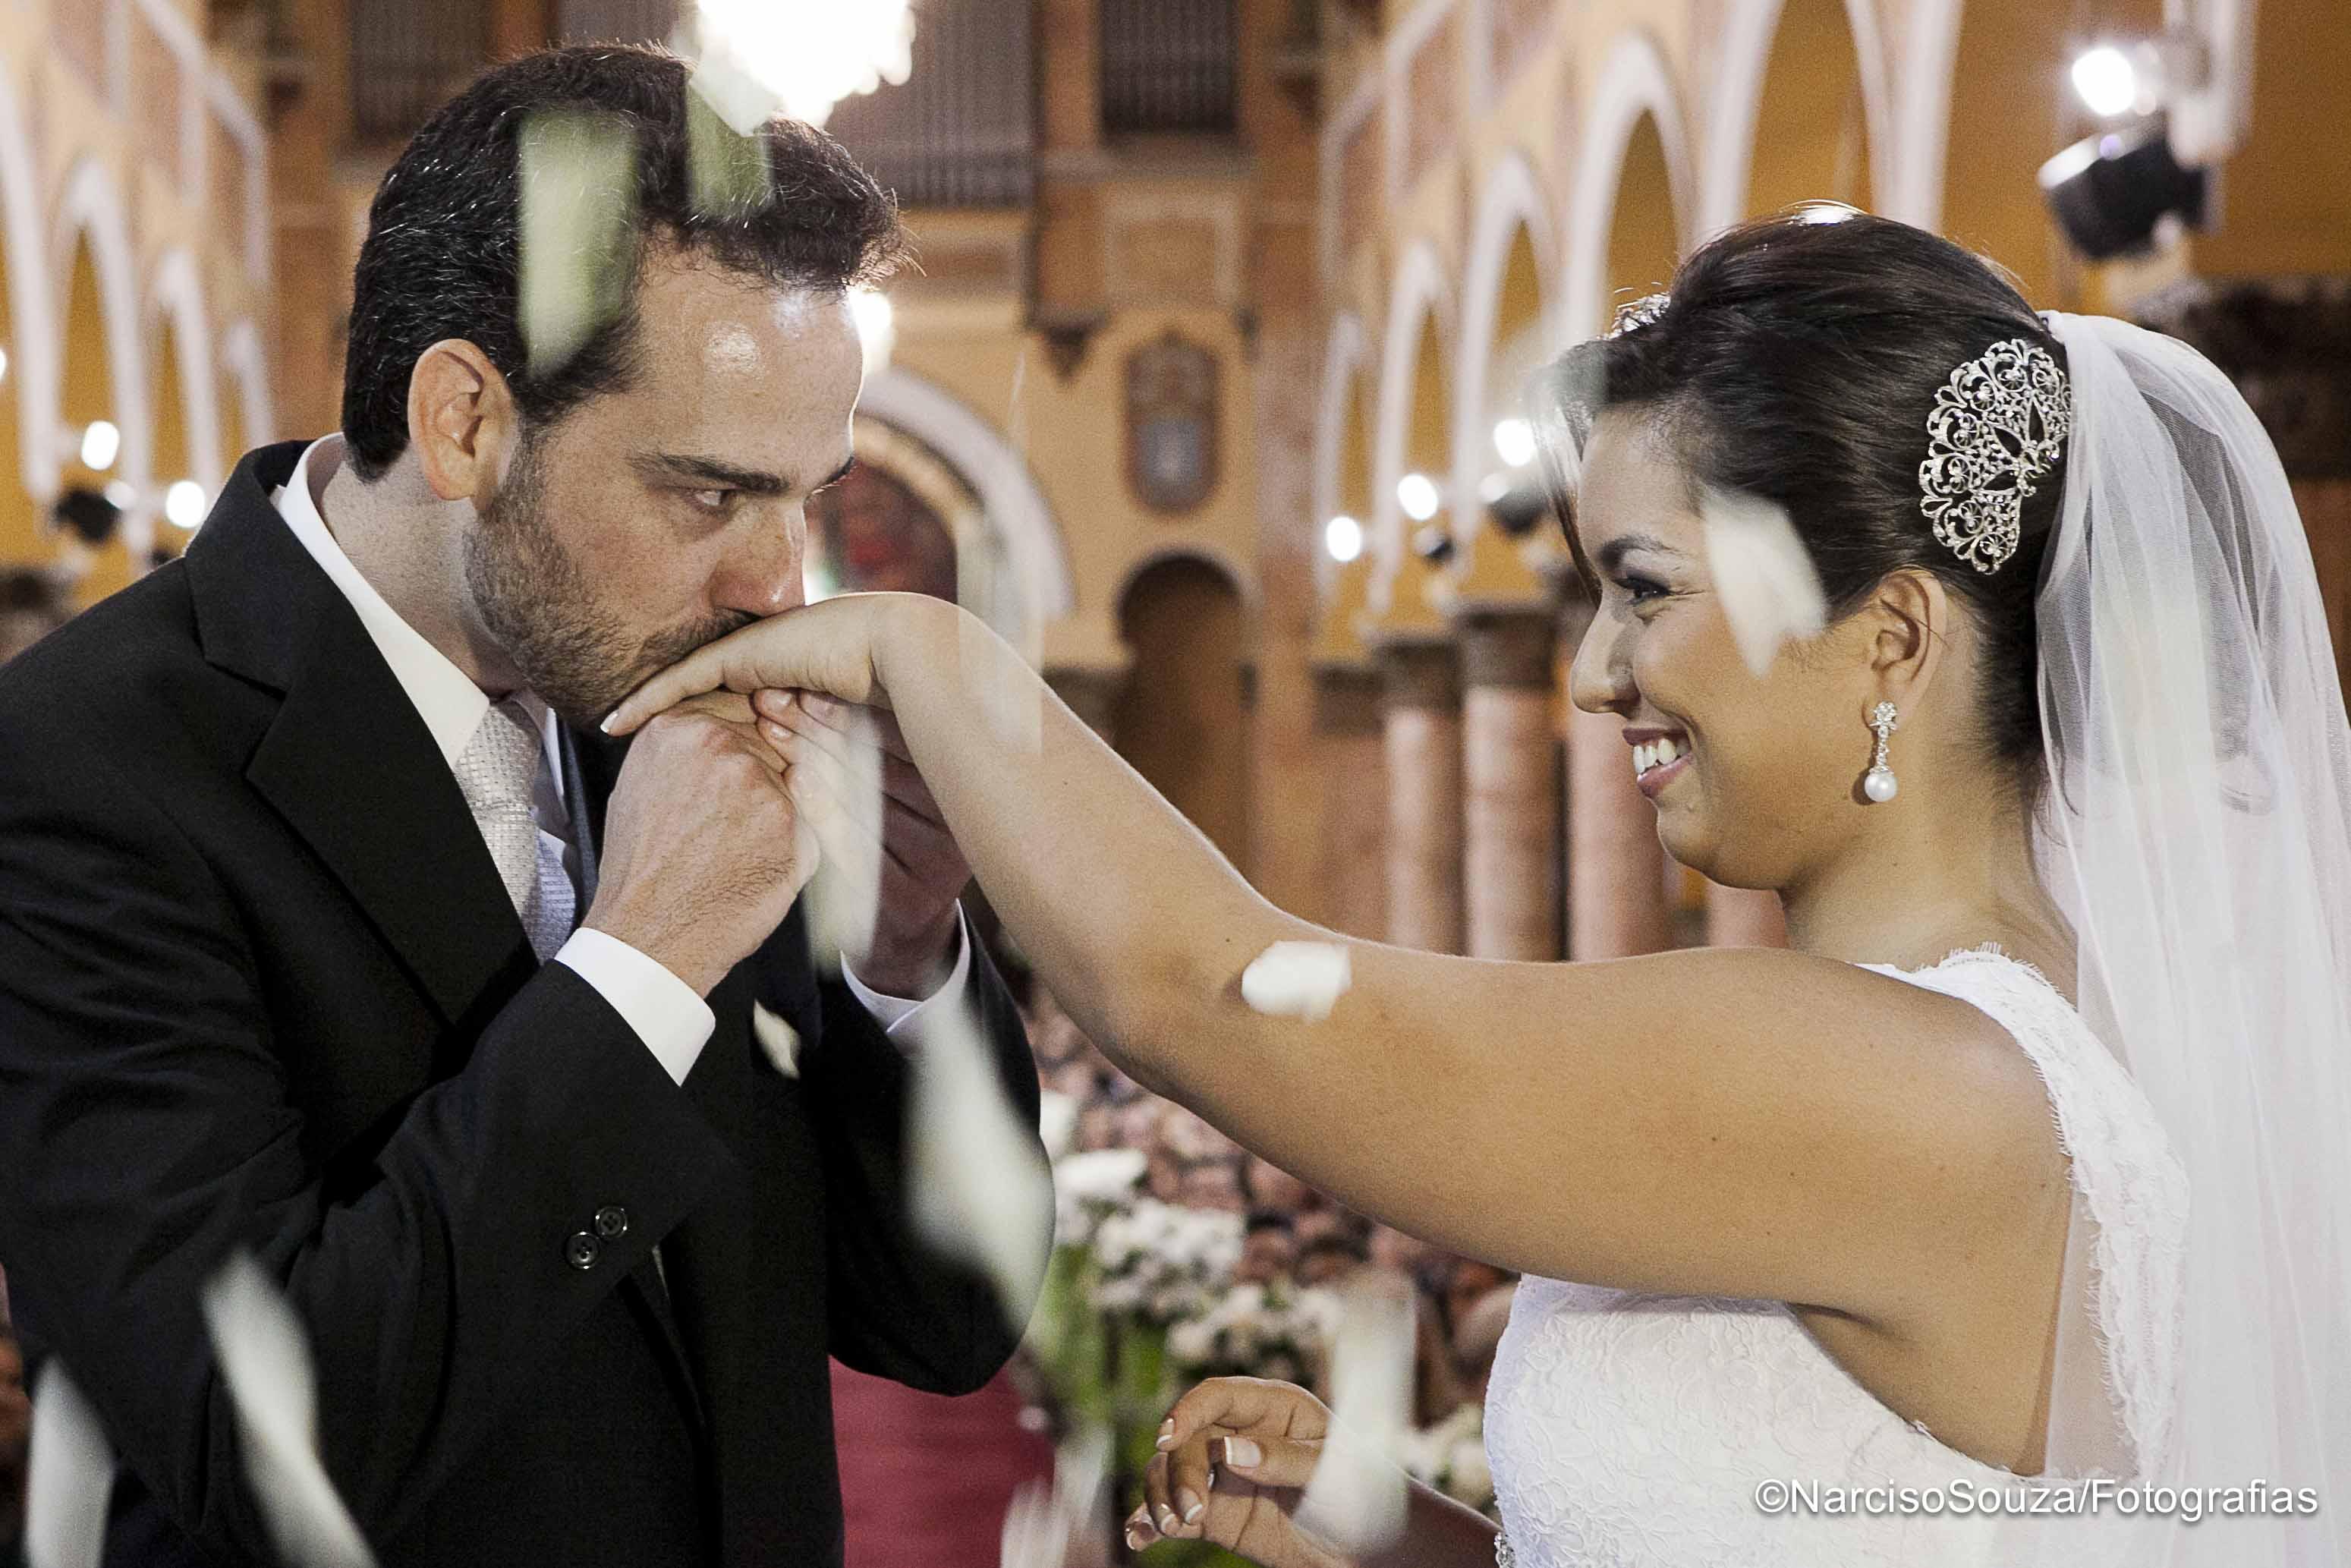 img 6545 Aline ♥ Felipe / Post I fotografo